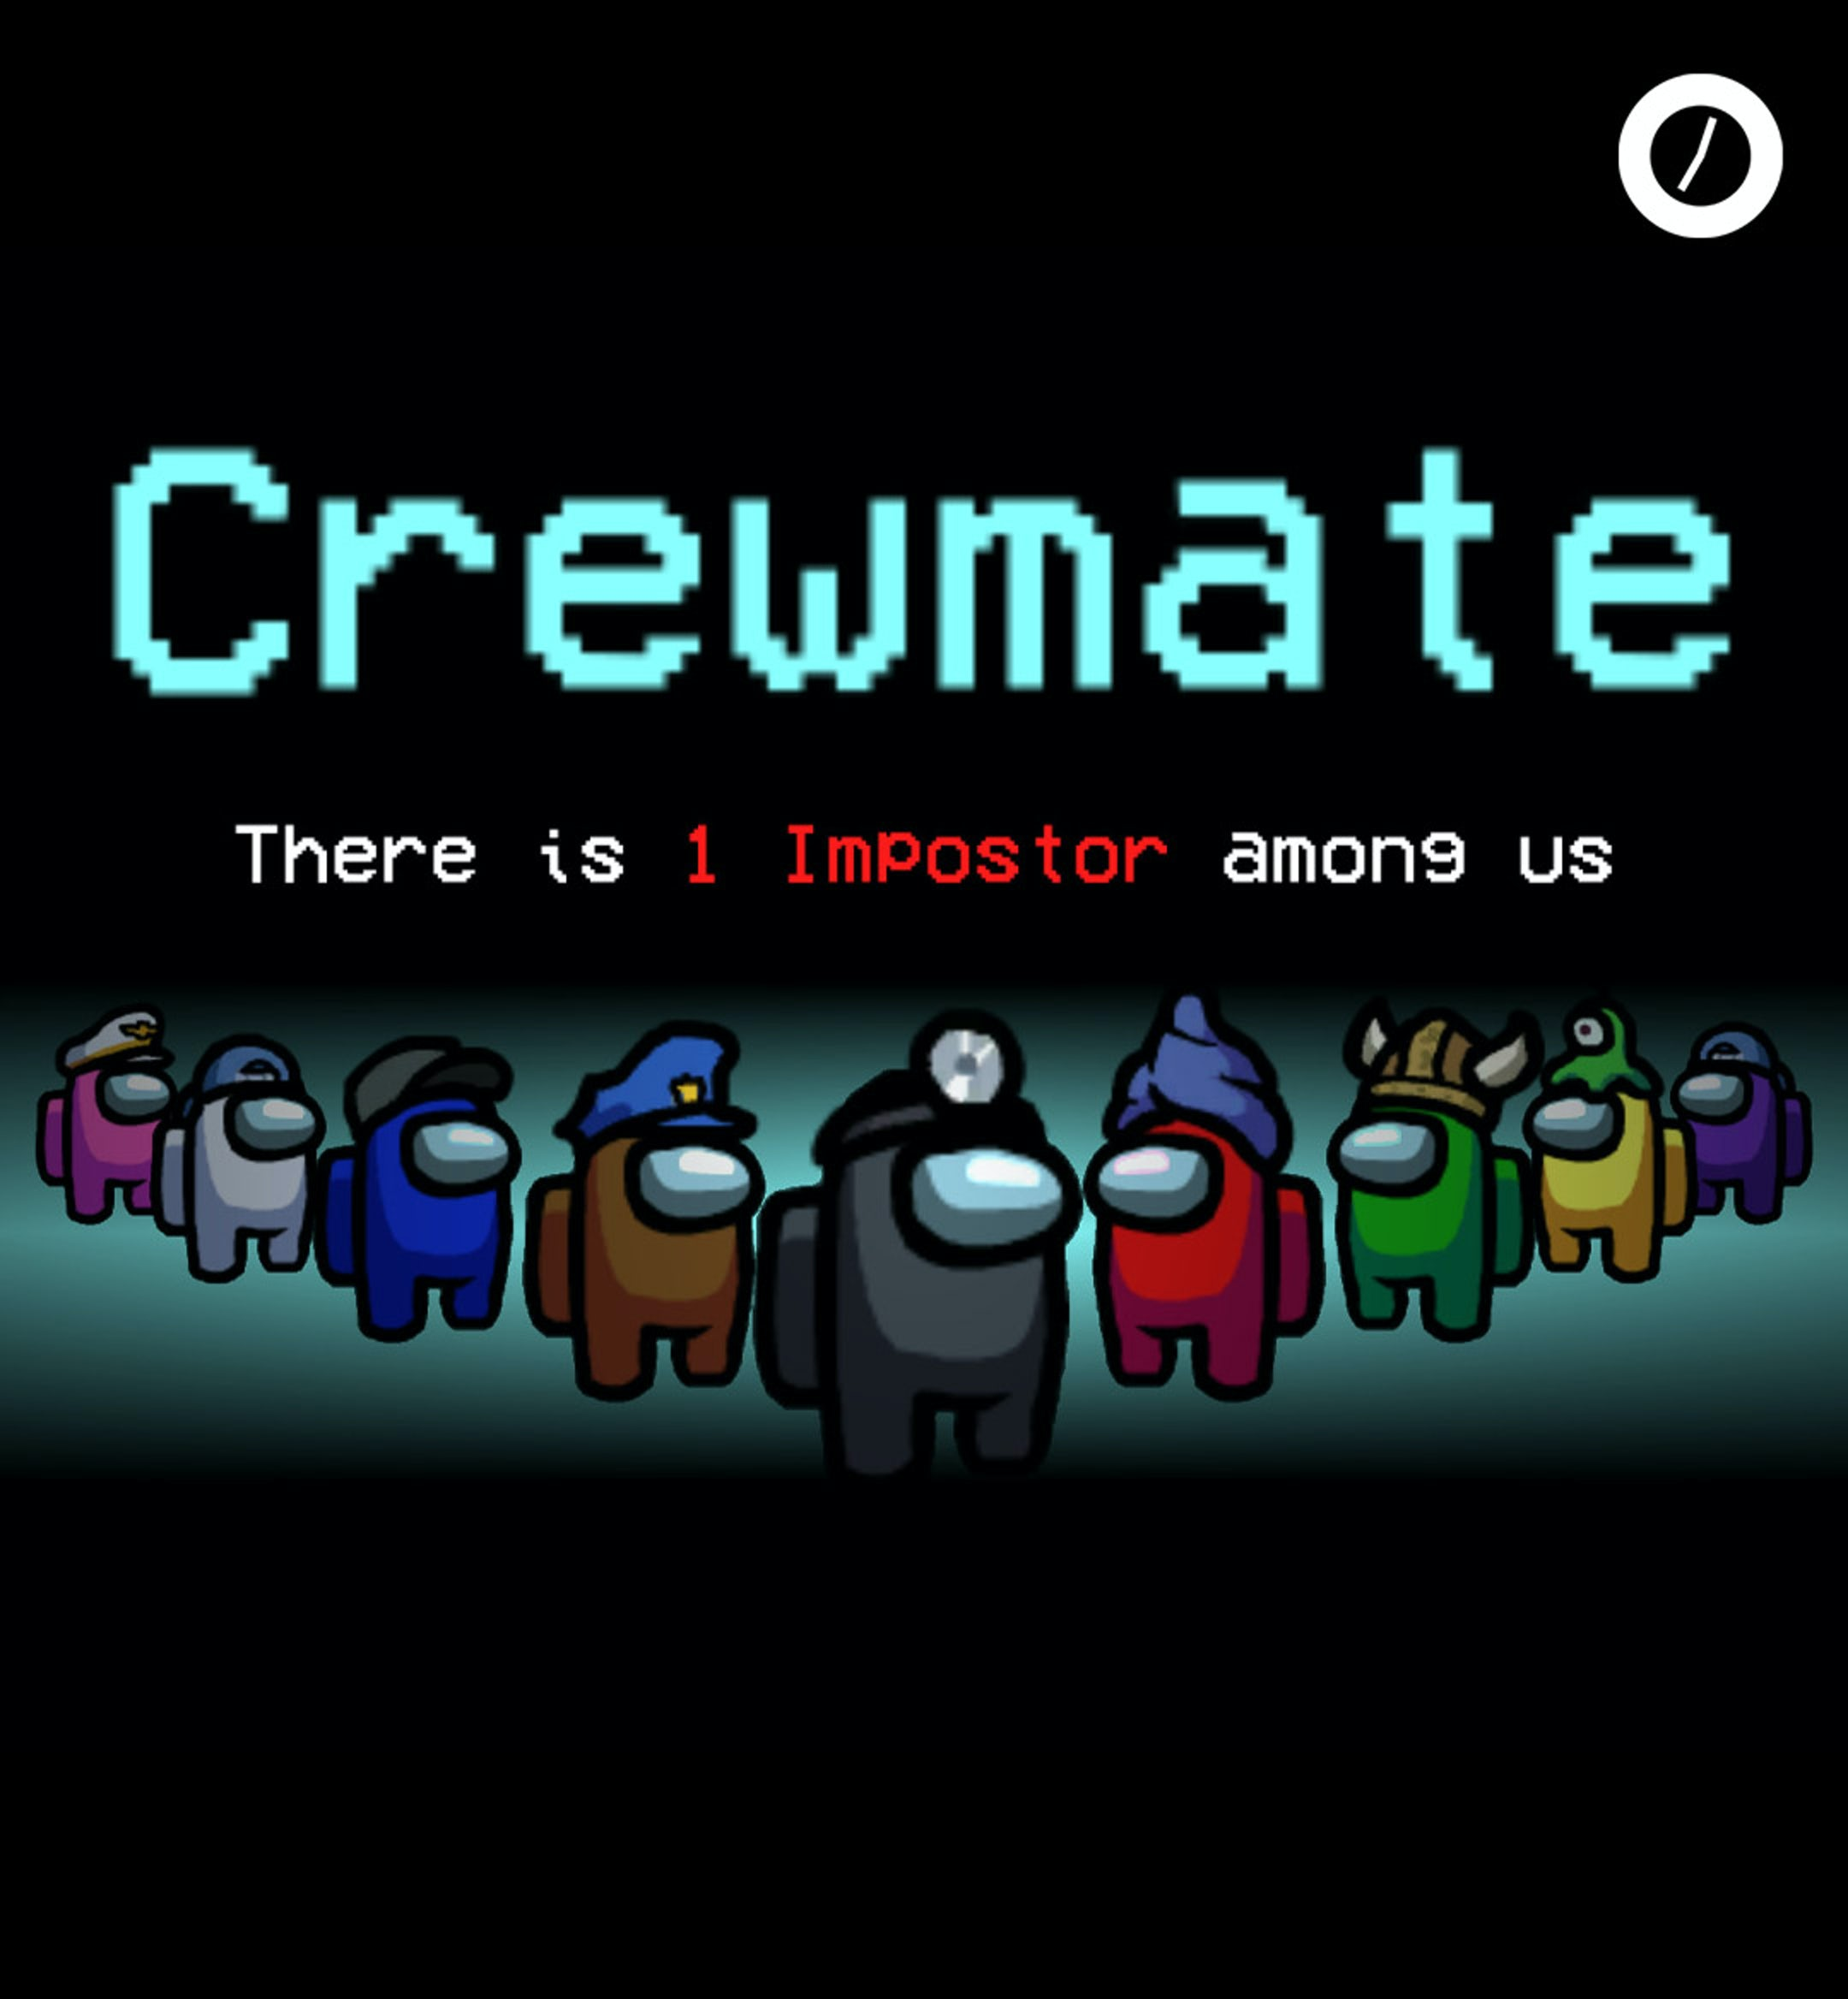 univ hero crewmate